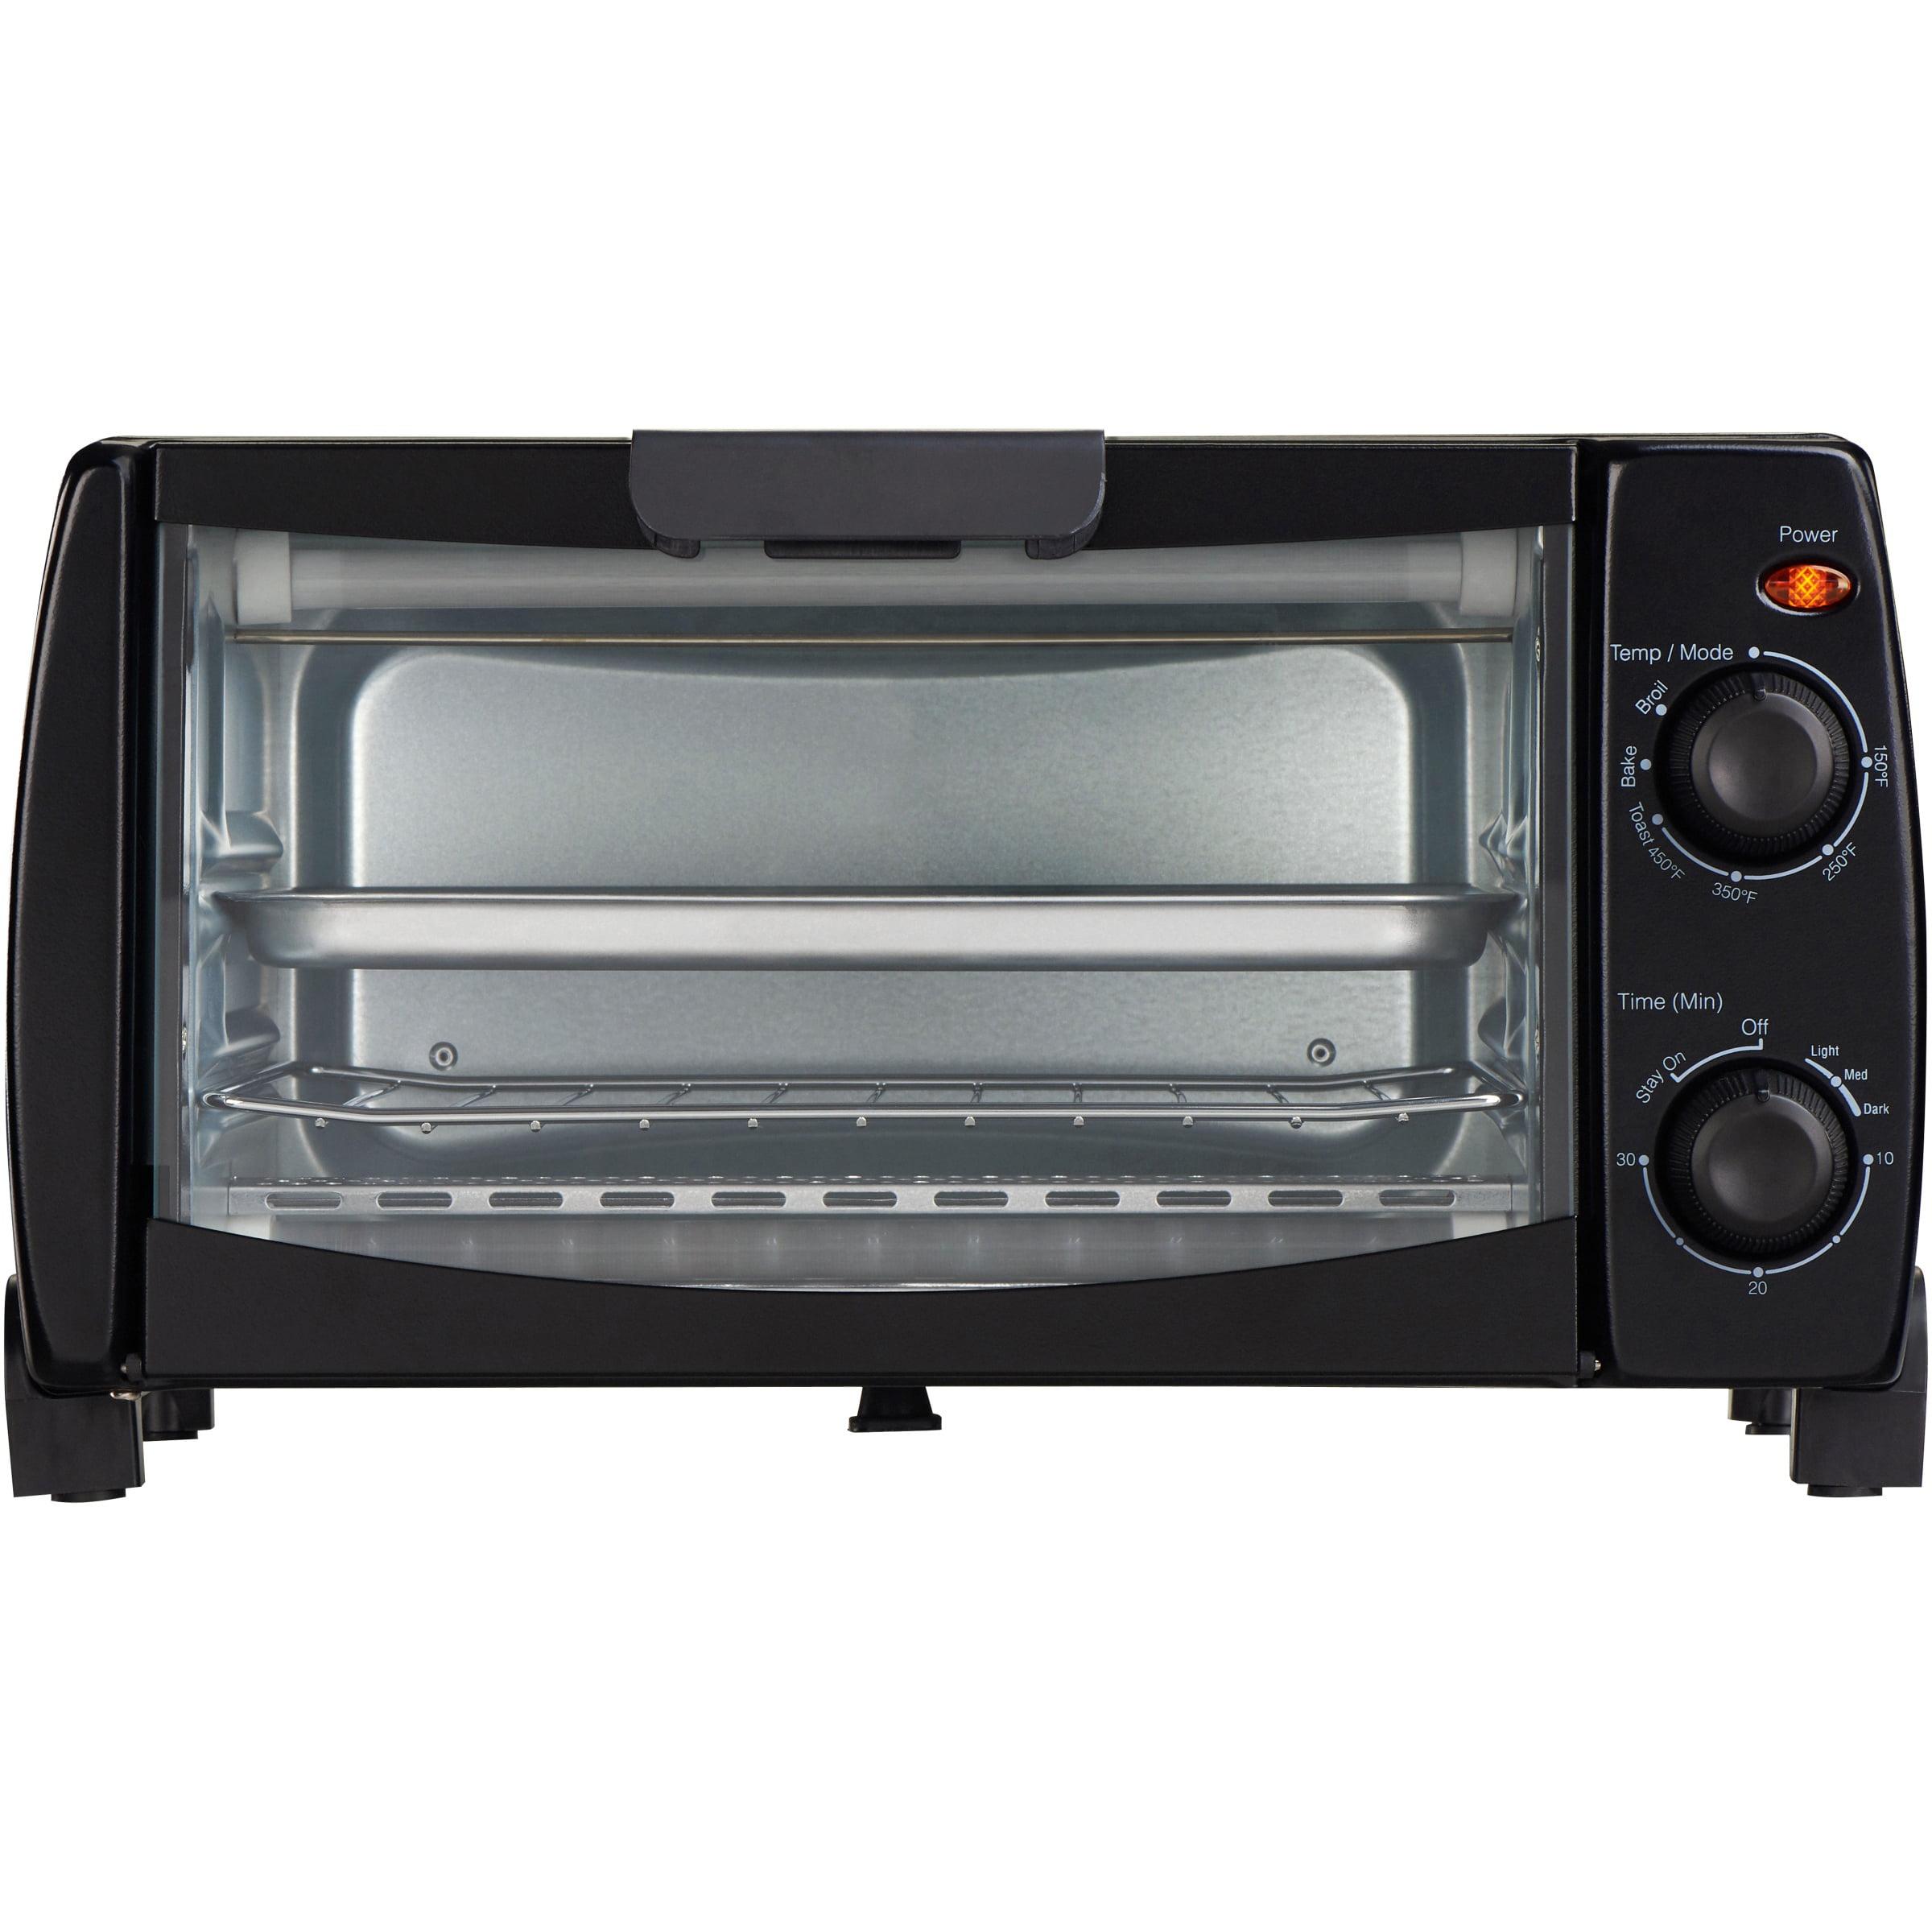 Mainstays 4-Slice Black Toaster Oven with Dishwasher-Safe Rack & Pan